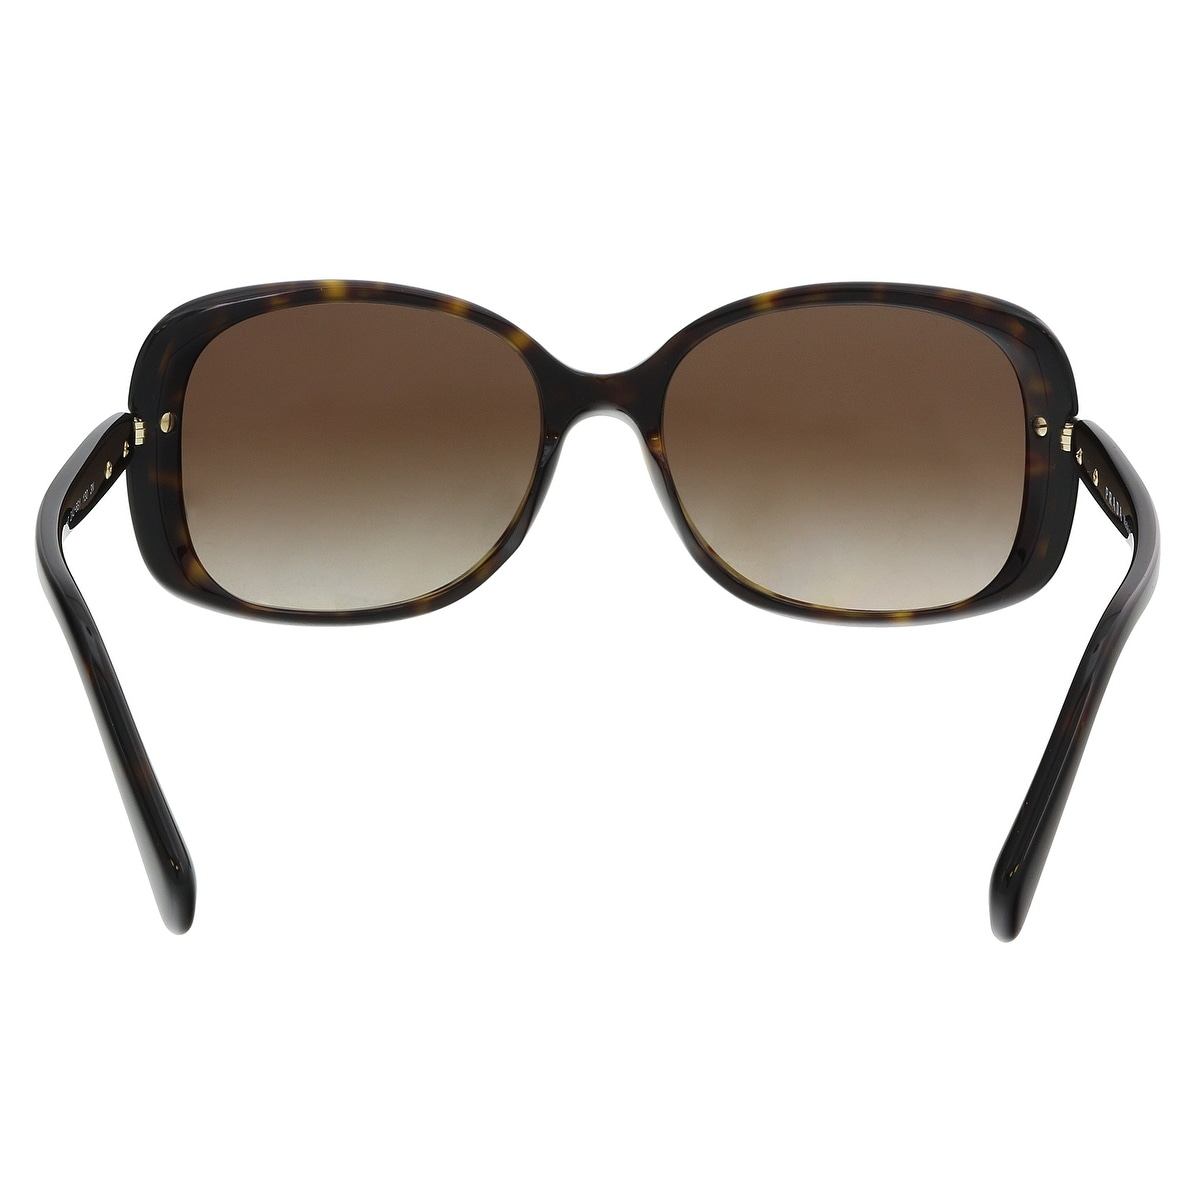 3d9b15700caa8d Shop Prada PR08OS 2AU6S1 Havana Rectangle Sunglasses - 57-17-130 - Free  Shipping Today - Overstock - 21158227